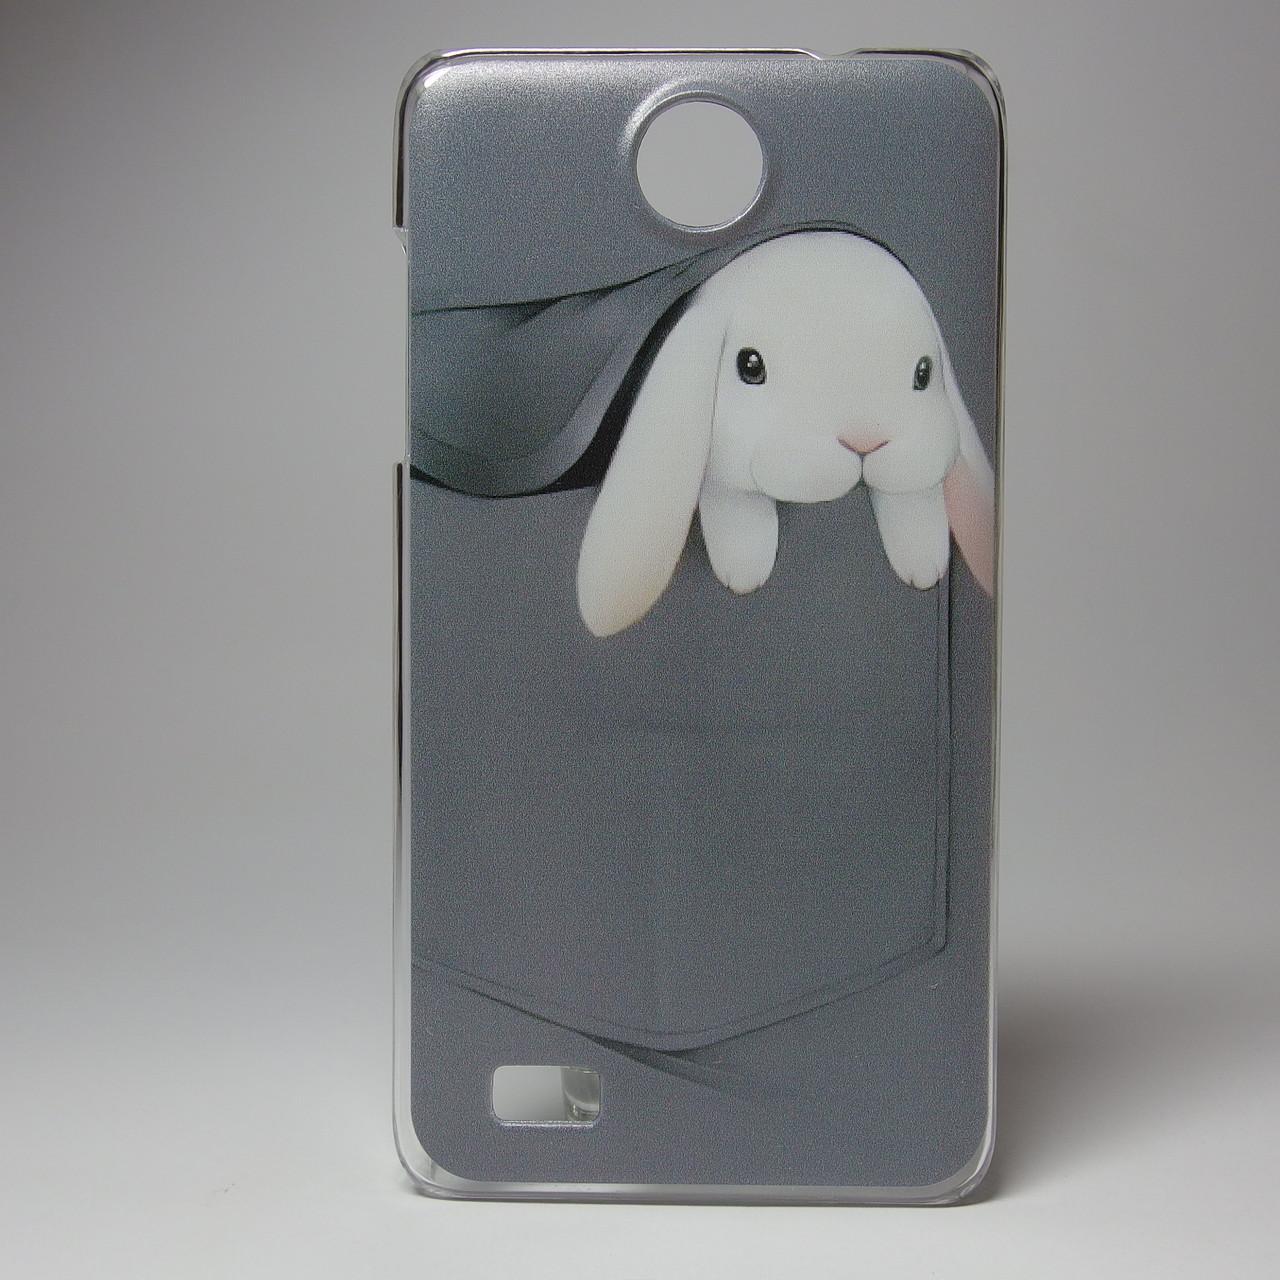 Чехол для lenovo a656 панель накладка с рисунком заяц